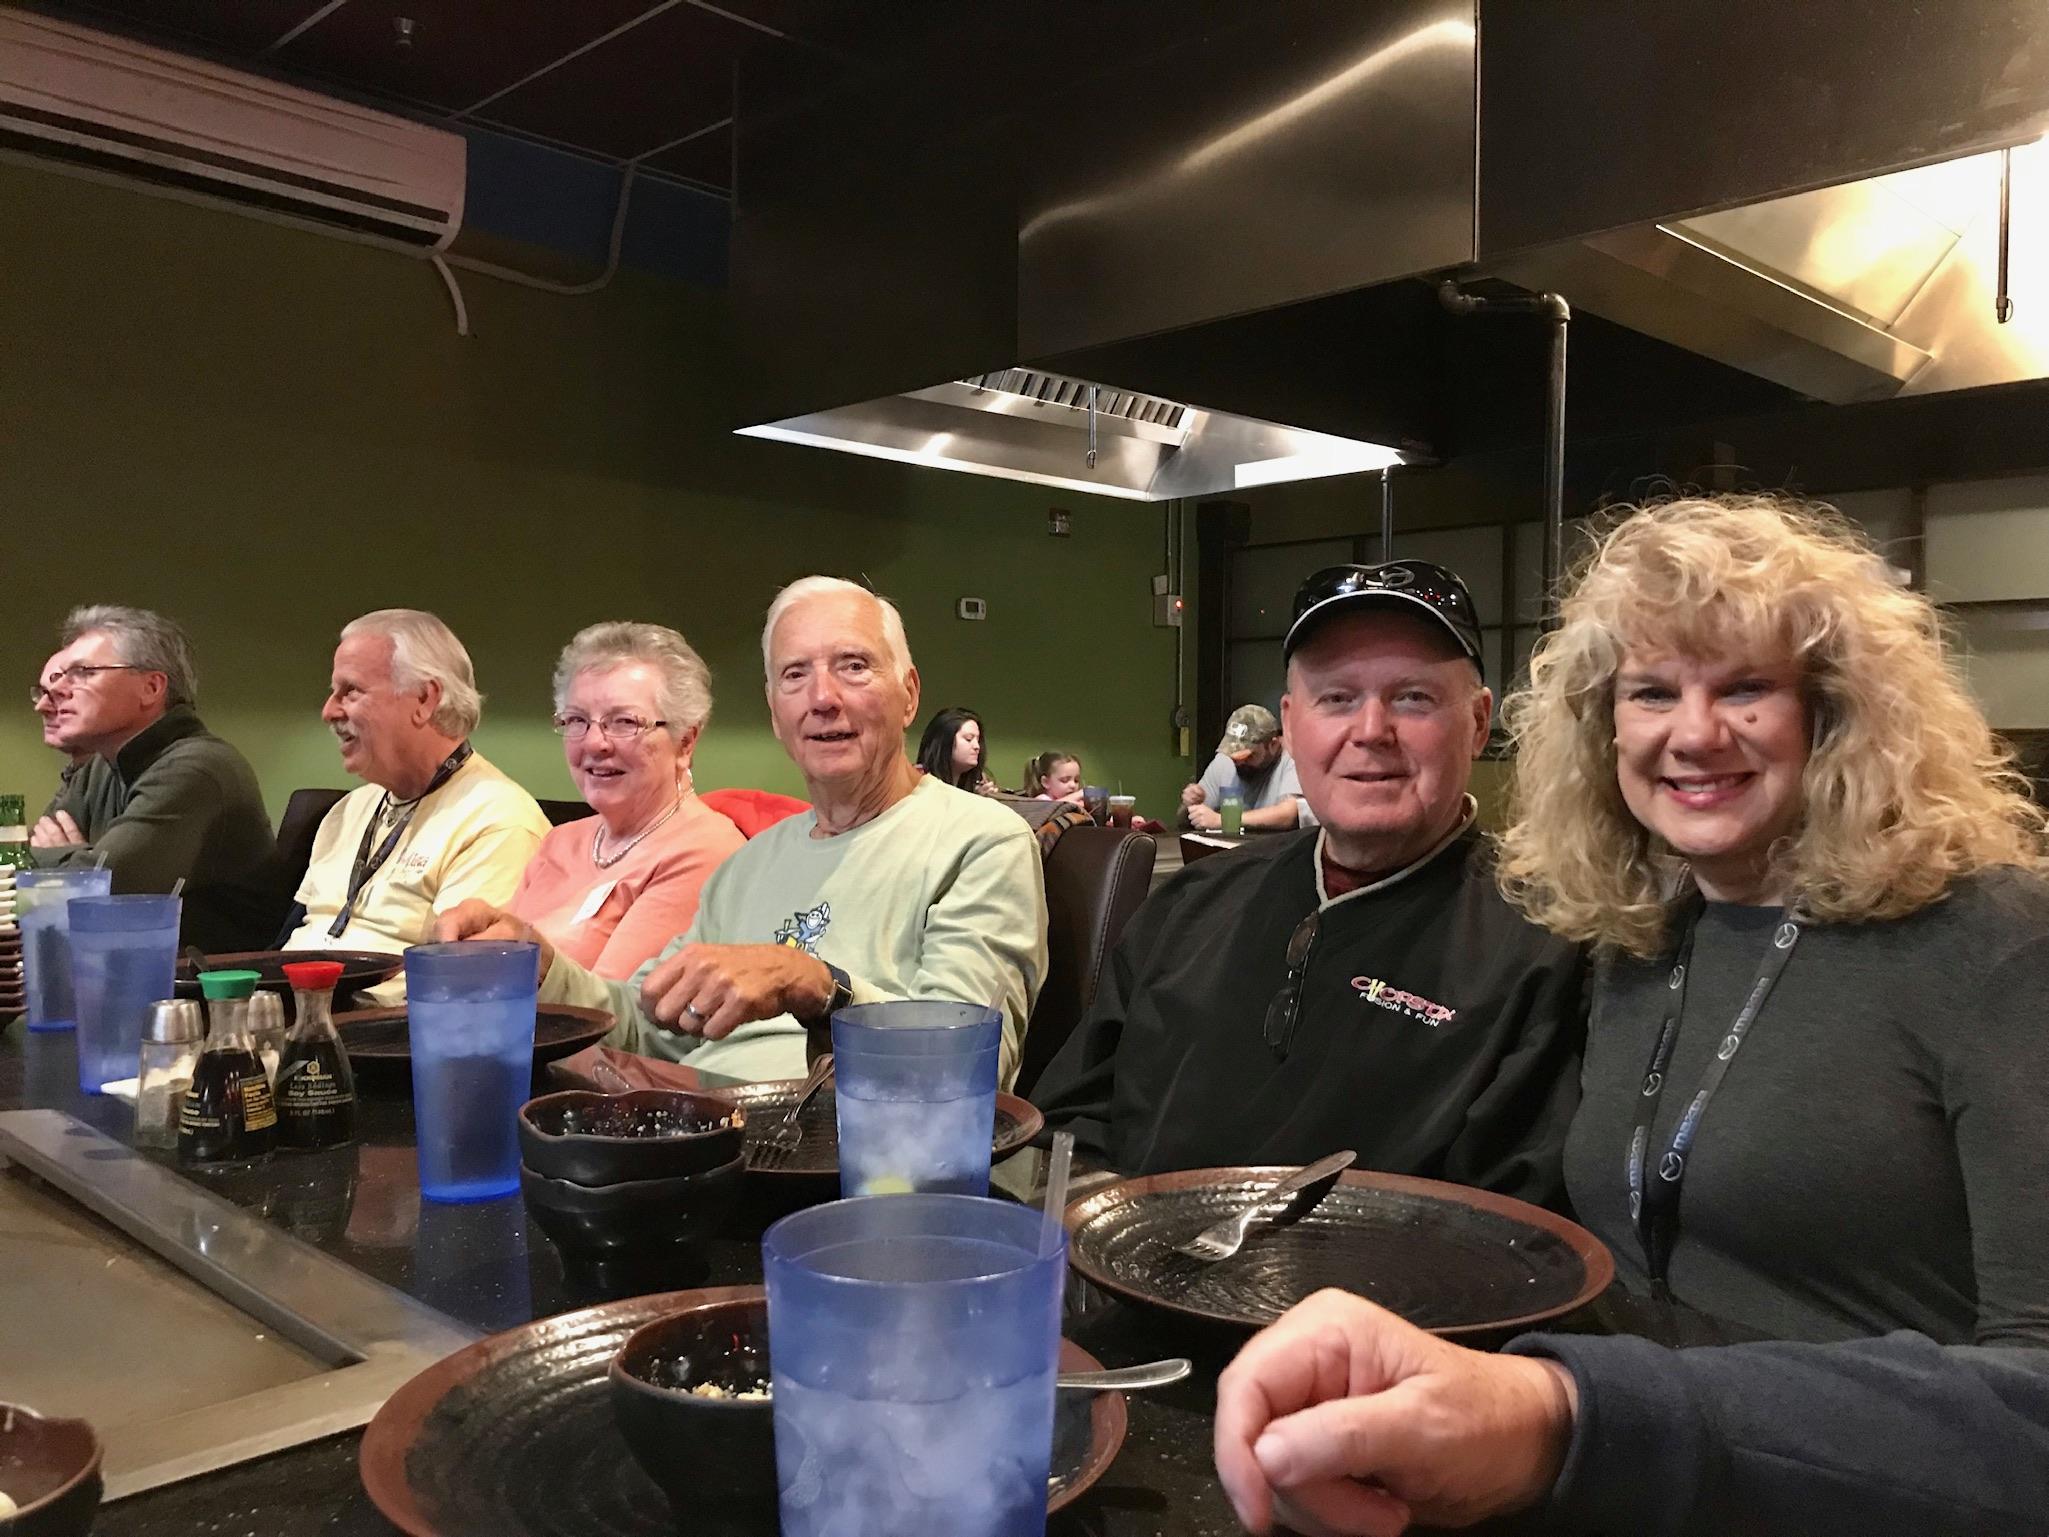 Mike Cory, Tracy Brown, Ken Ingram, Lana & Bob Horneck, Jasper & Carolyn White enjoying their meal at Tokyo Japanese Restaurant